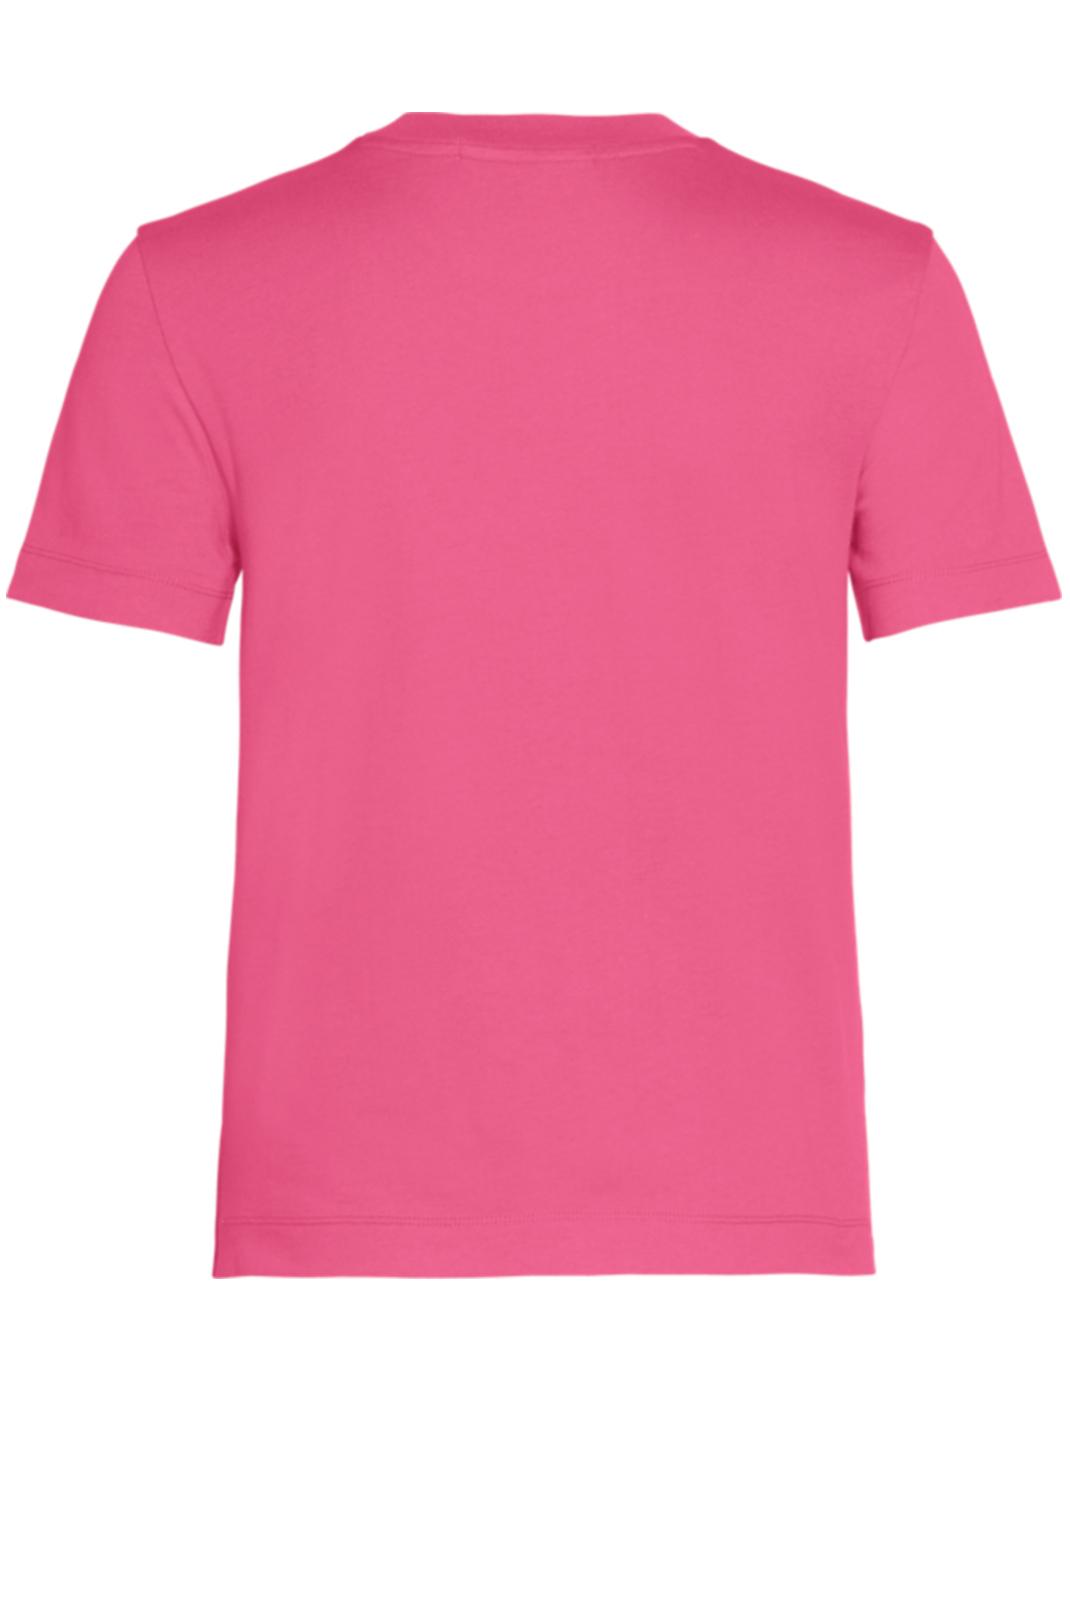 Tee shirt  Calvin klein J20J212879 VGY RASPBERRY SORBET